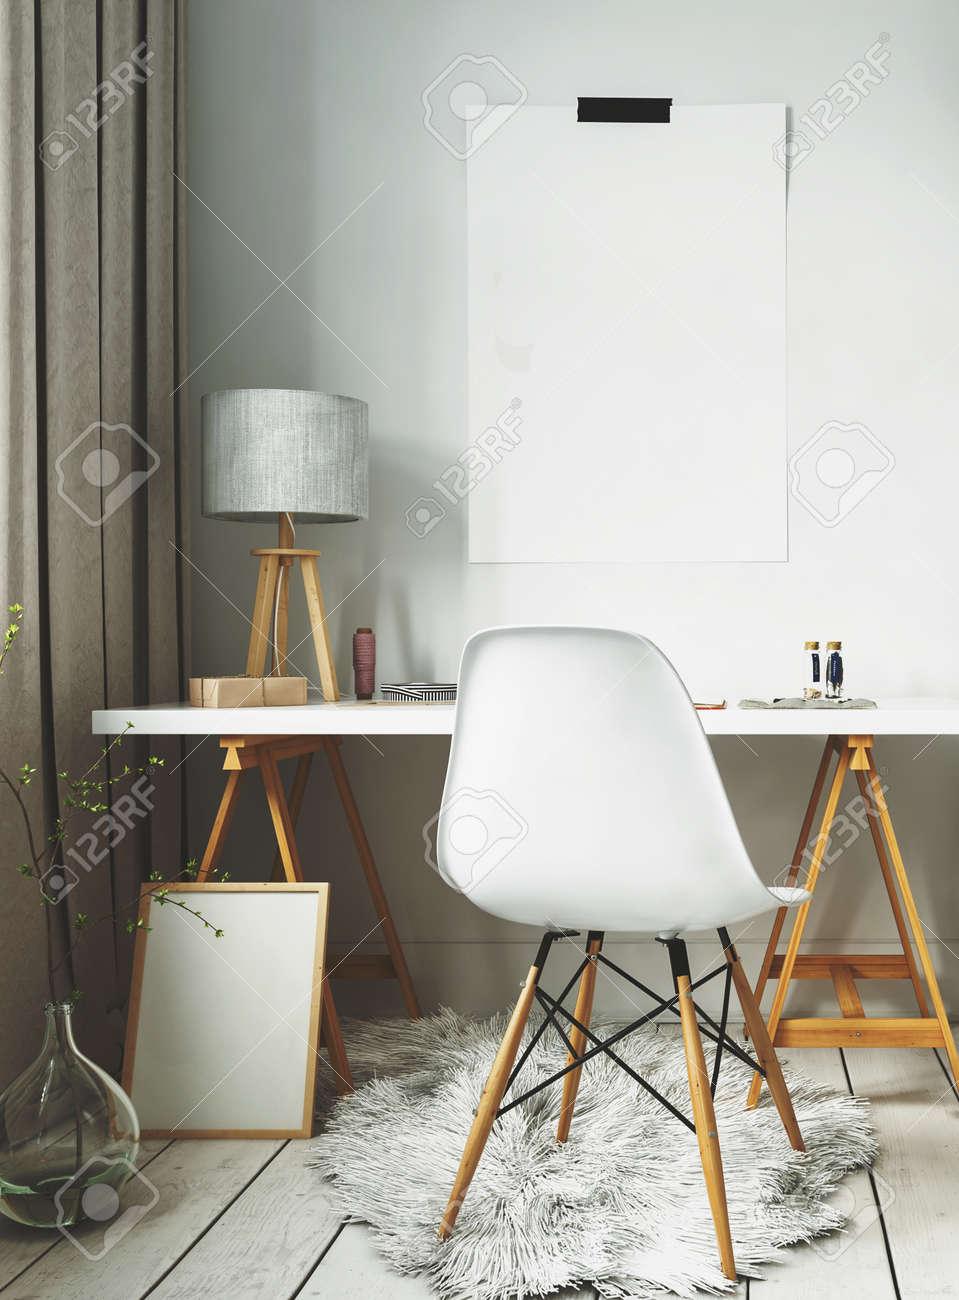 White fur rug and simple desk of modern Scandinavian interior design. 3d Rendering. Standard-Bild - 62734376